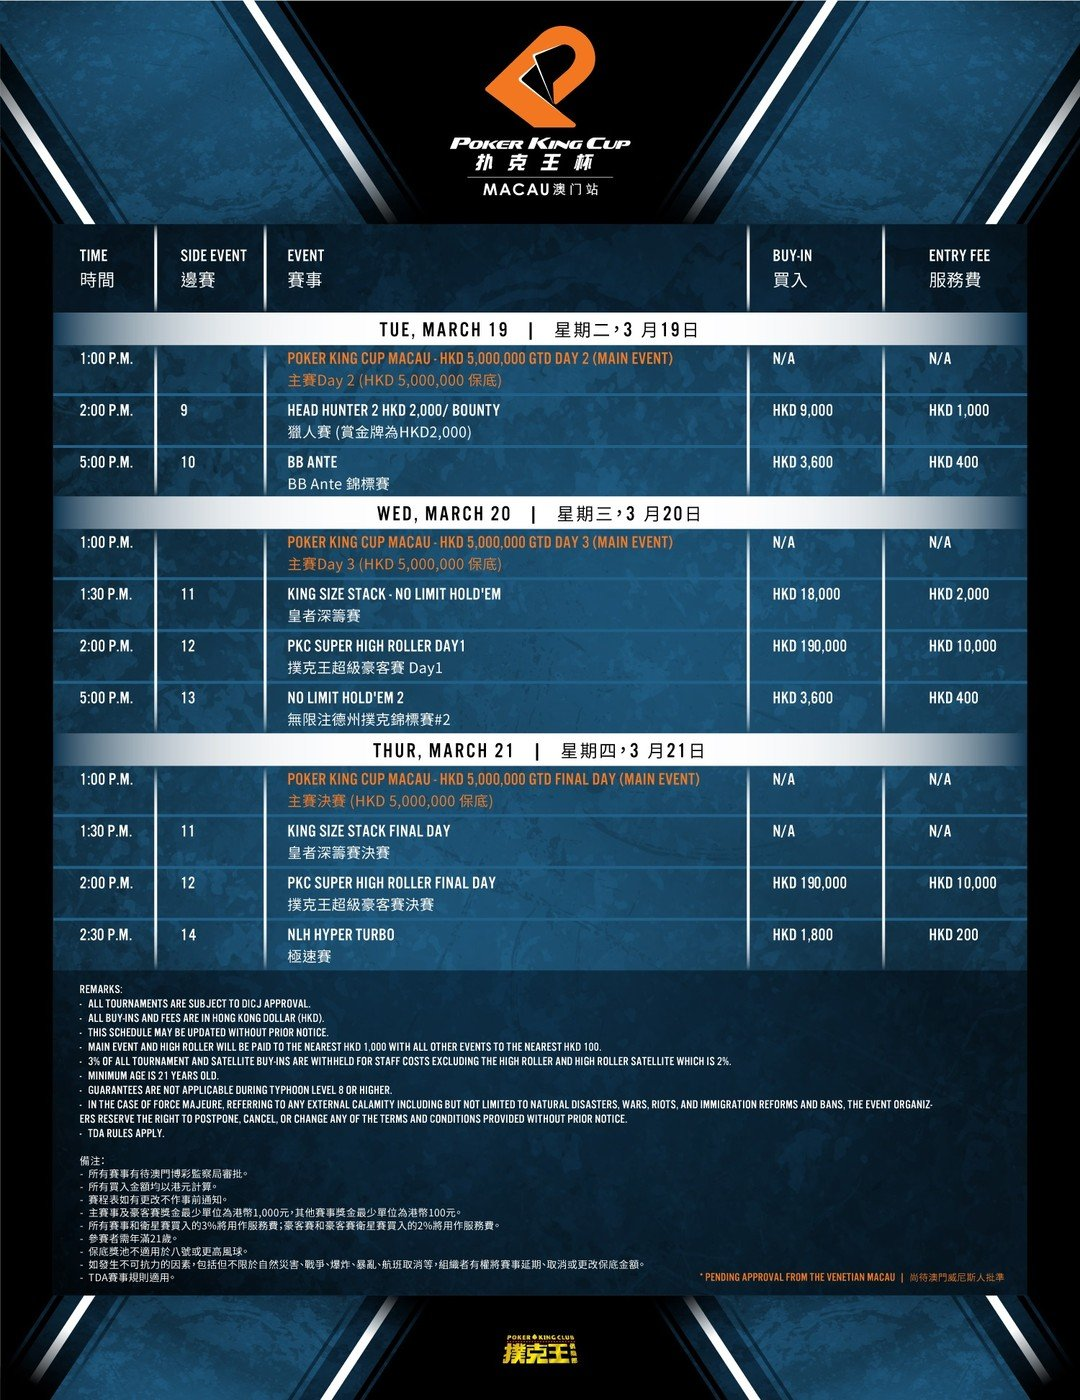 poker-king-cup-macau-2019-schedule-2